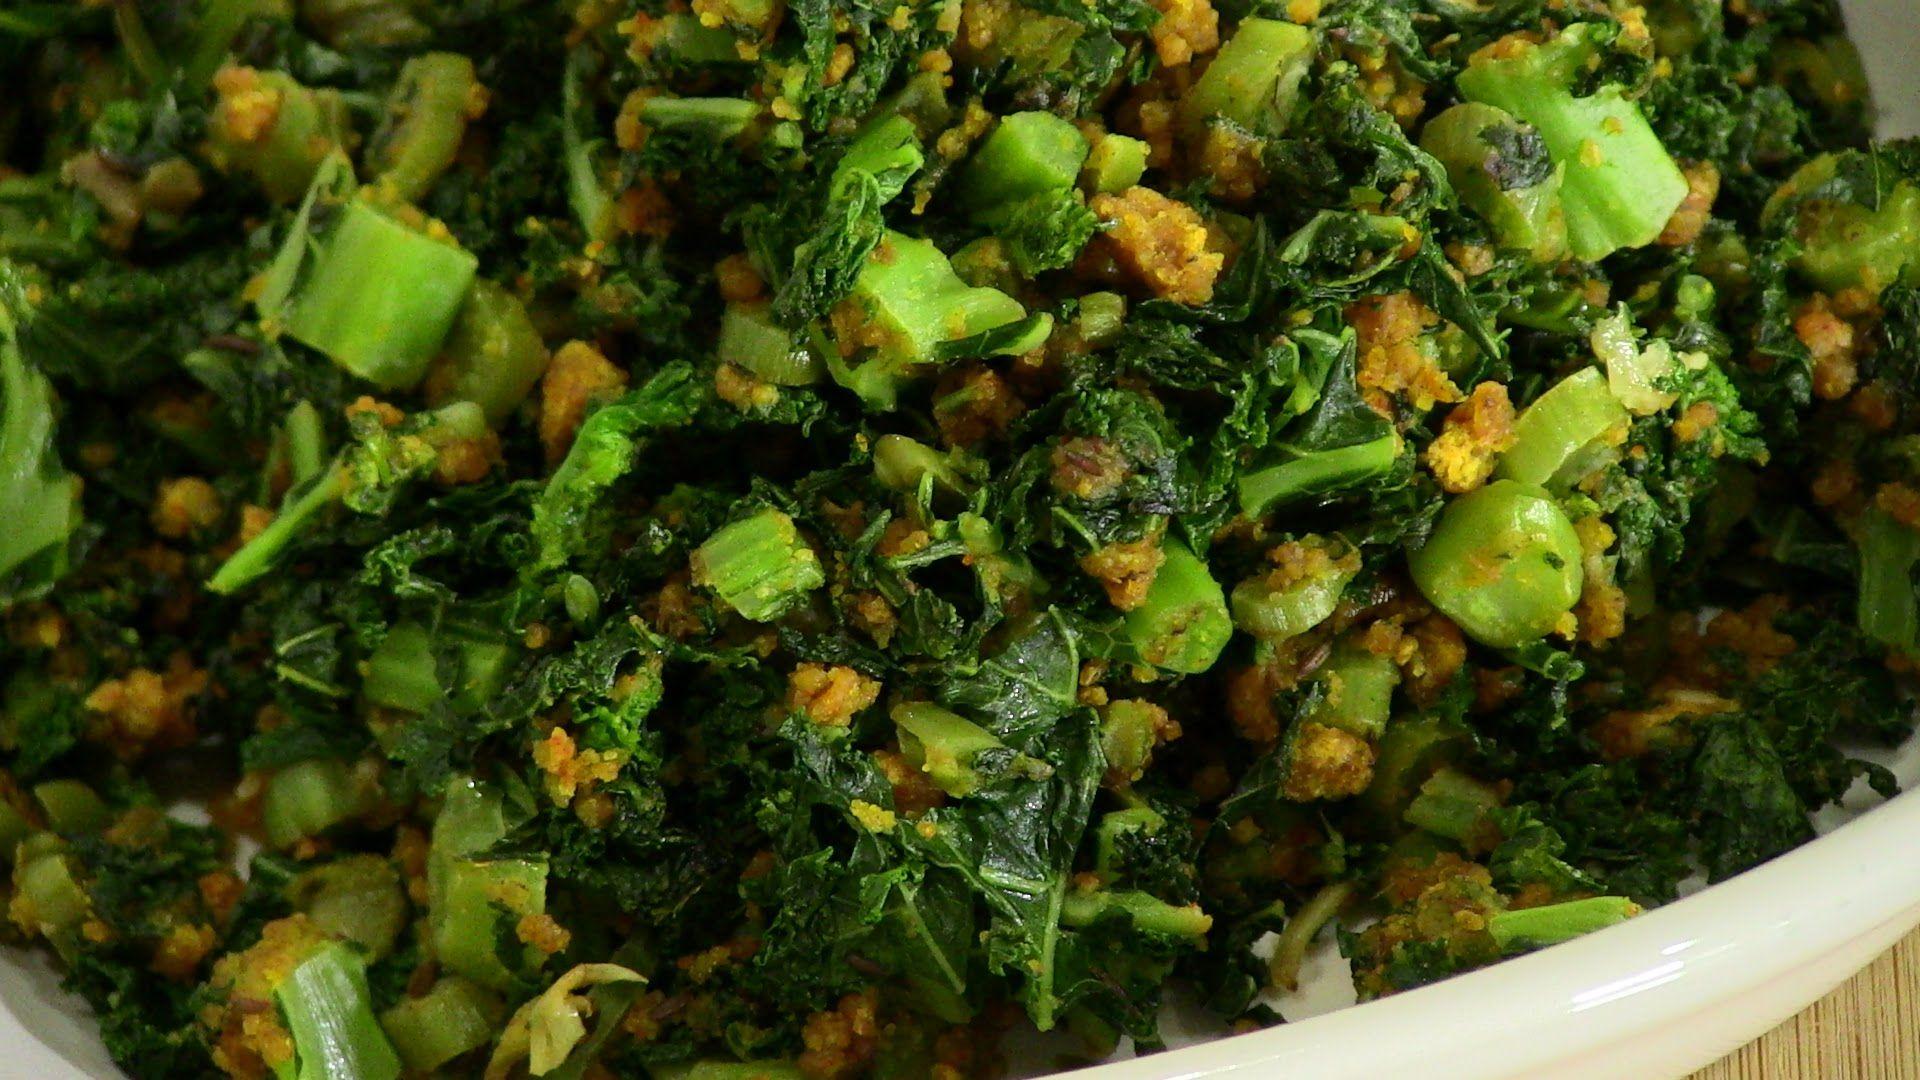 Kale subzi indian vegetarian recipe youtube eating vegetarian kale subzi indian vegetarian recipe youtube forumfinder Image collections